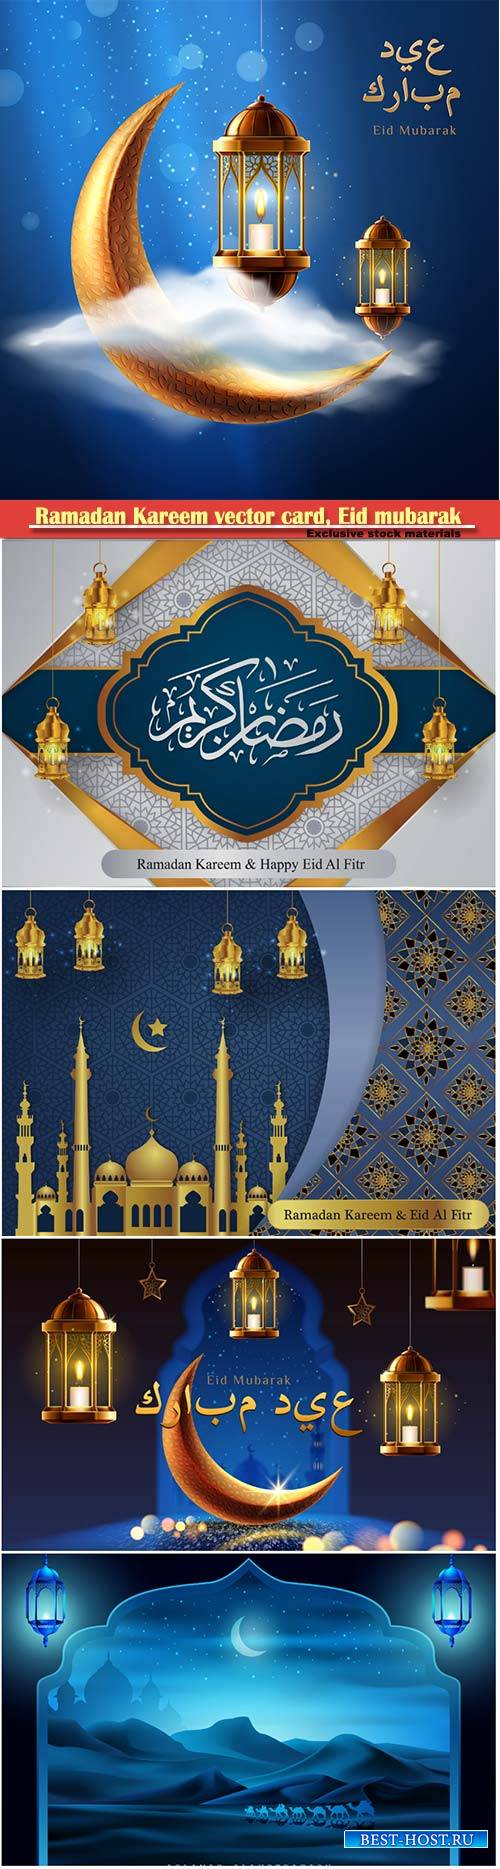 Ramadan Kareem vector card, Eid mubarak calligraphy design templates # 17